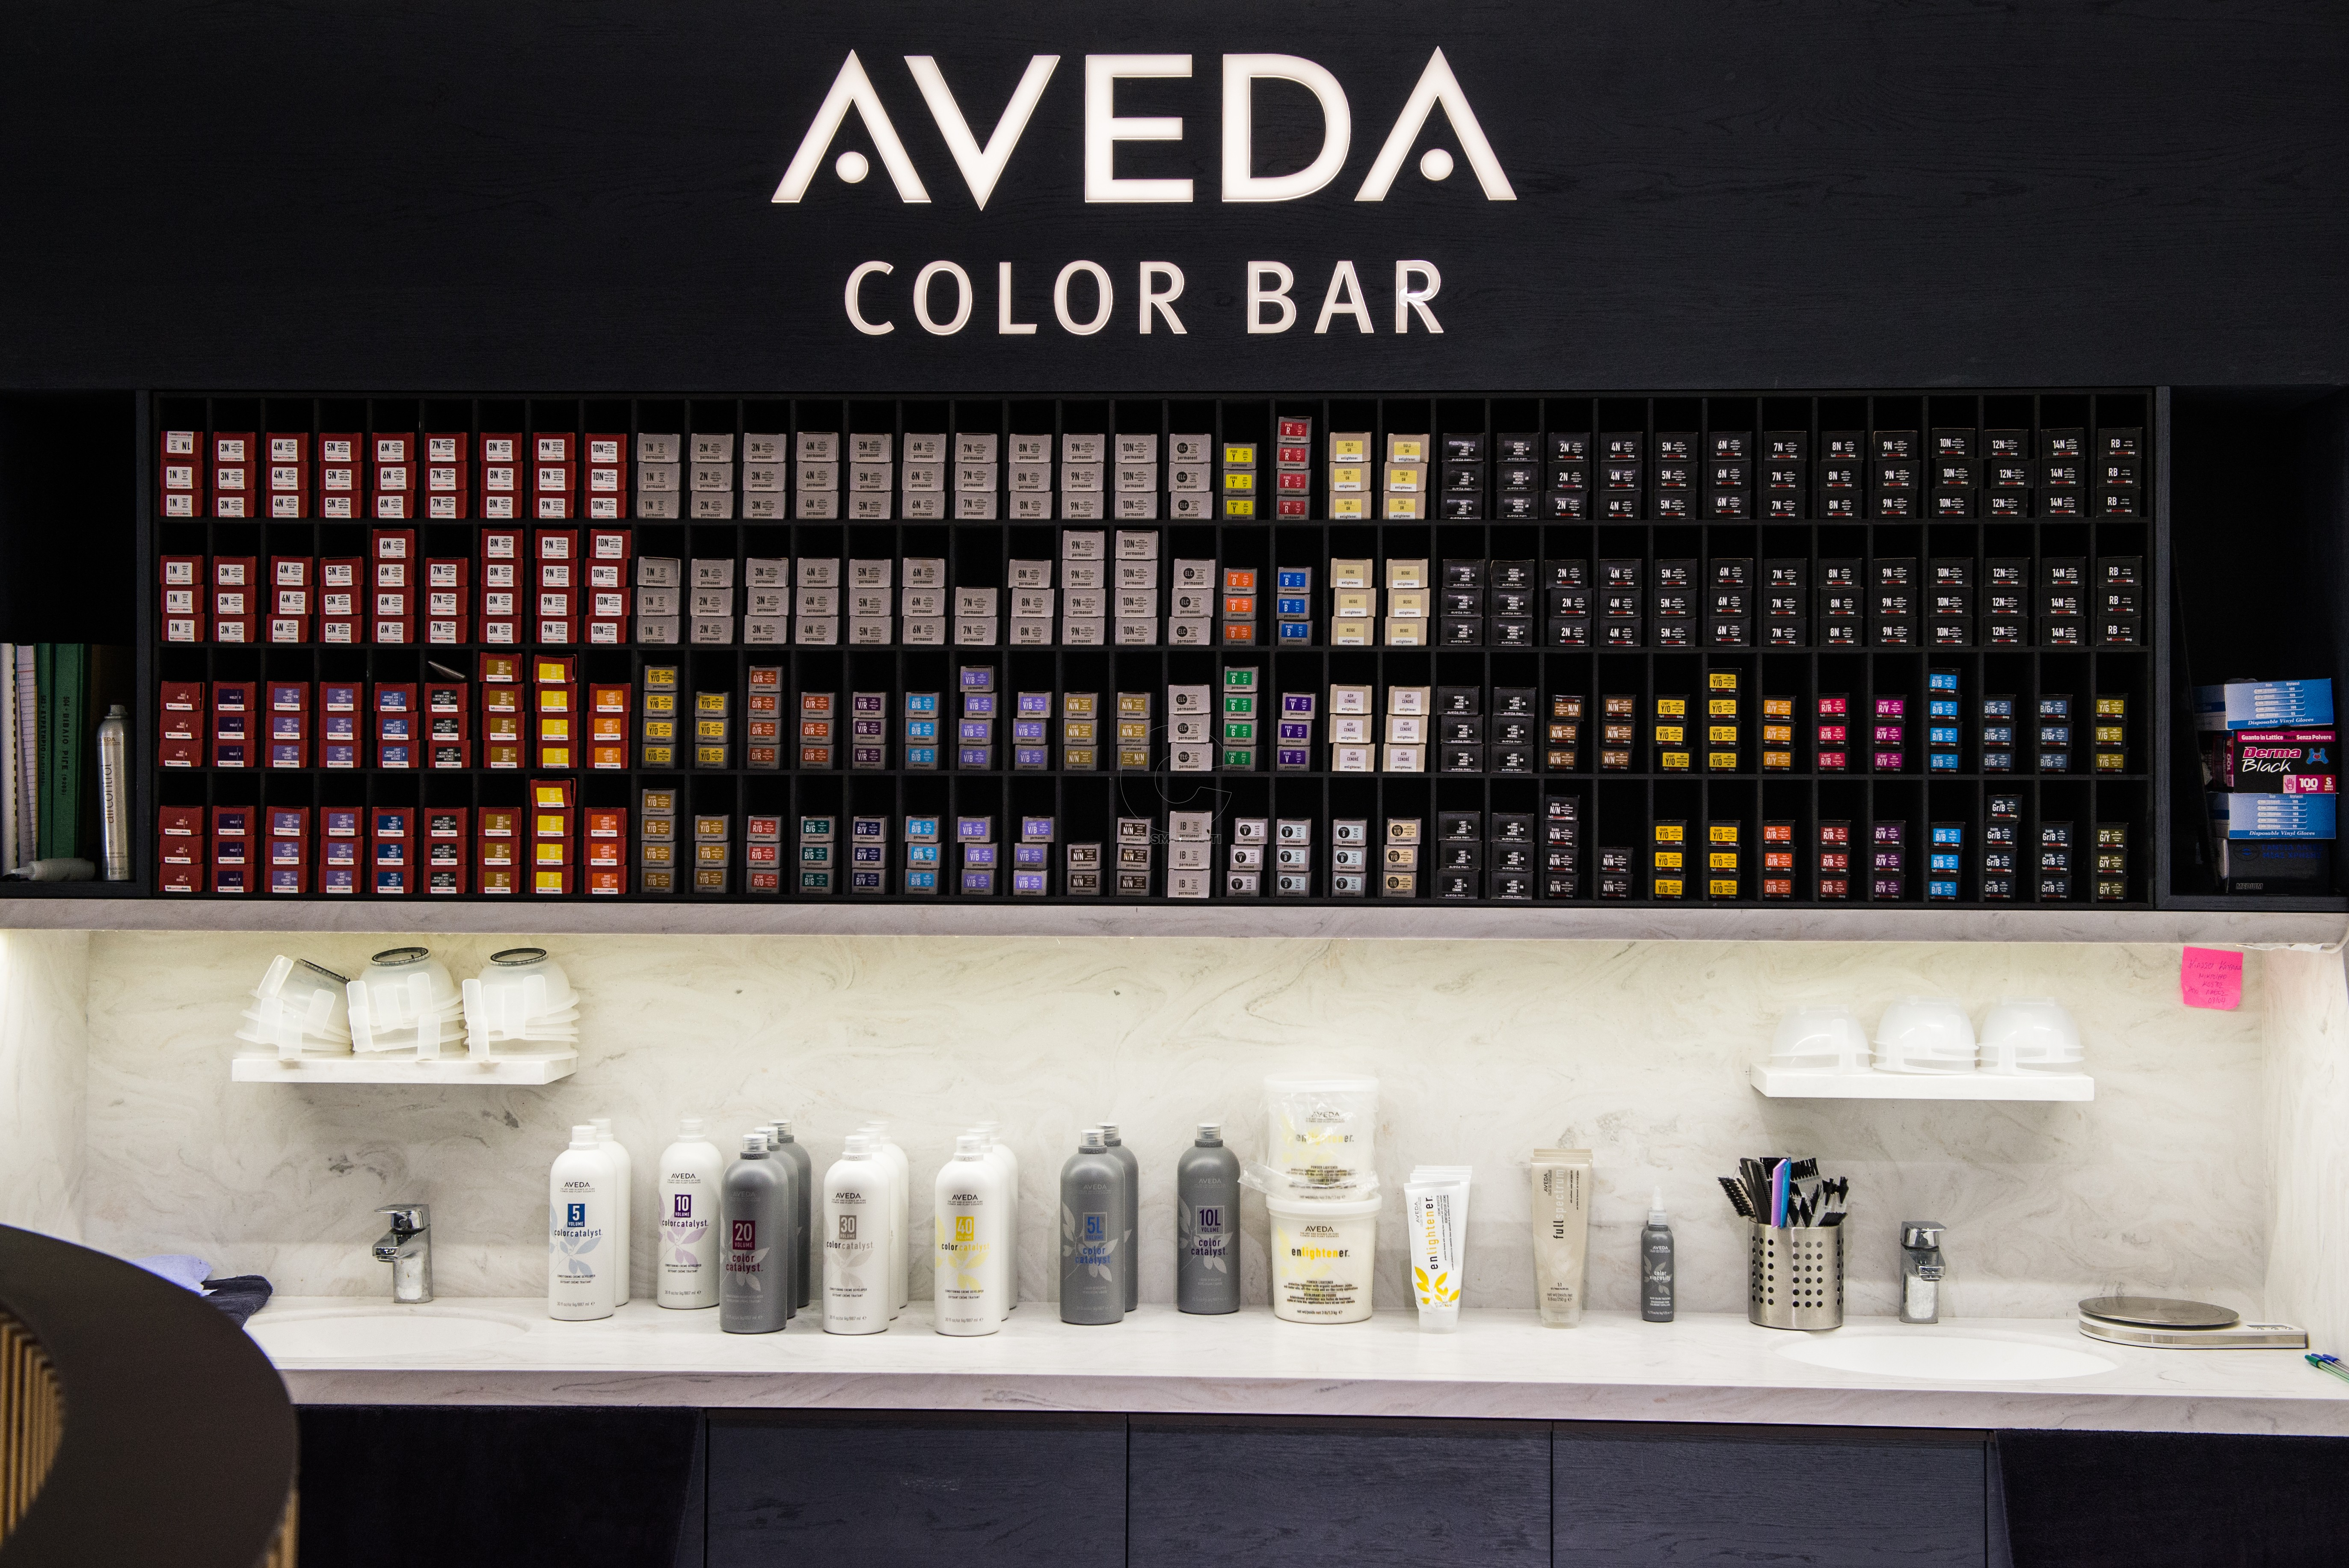 1.KYN_2158 Το Aveda Colour Bar - Αντιγραφή - Αντιγραφή - Αντιγραφή